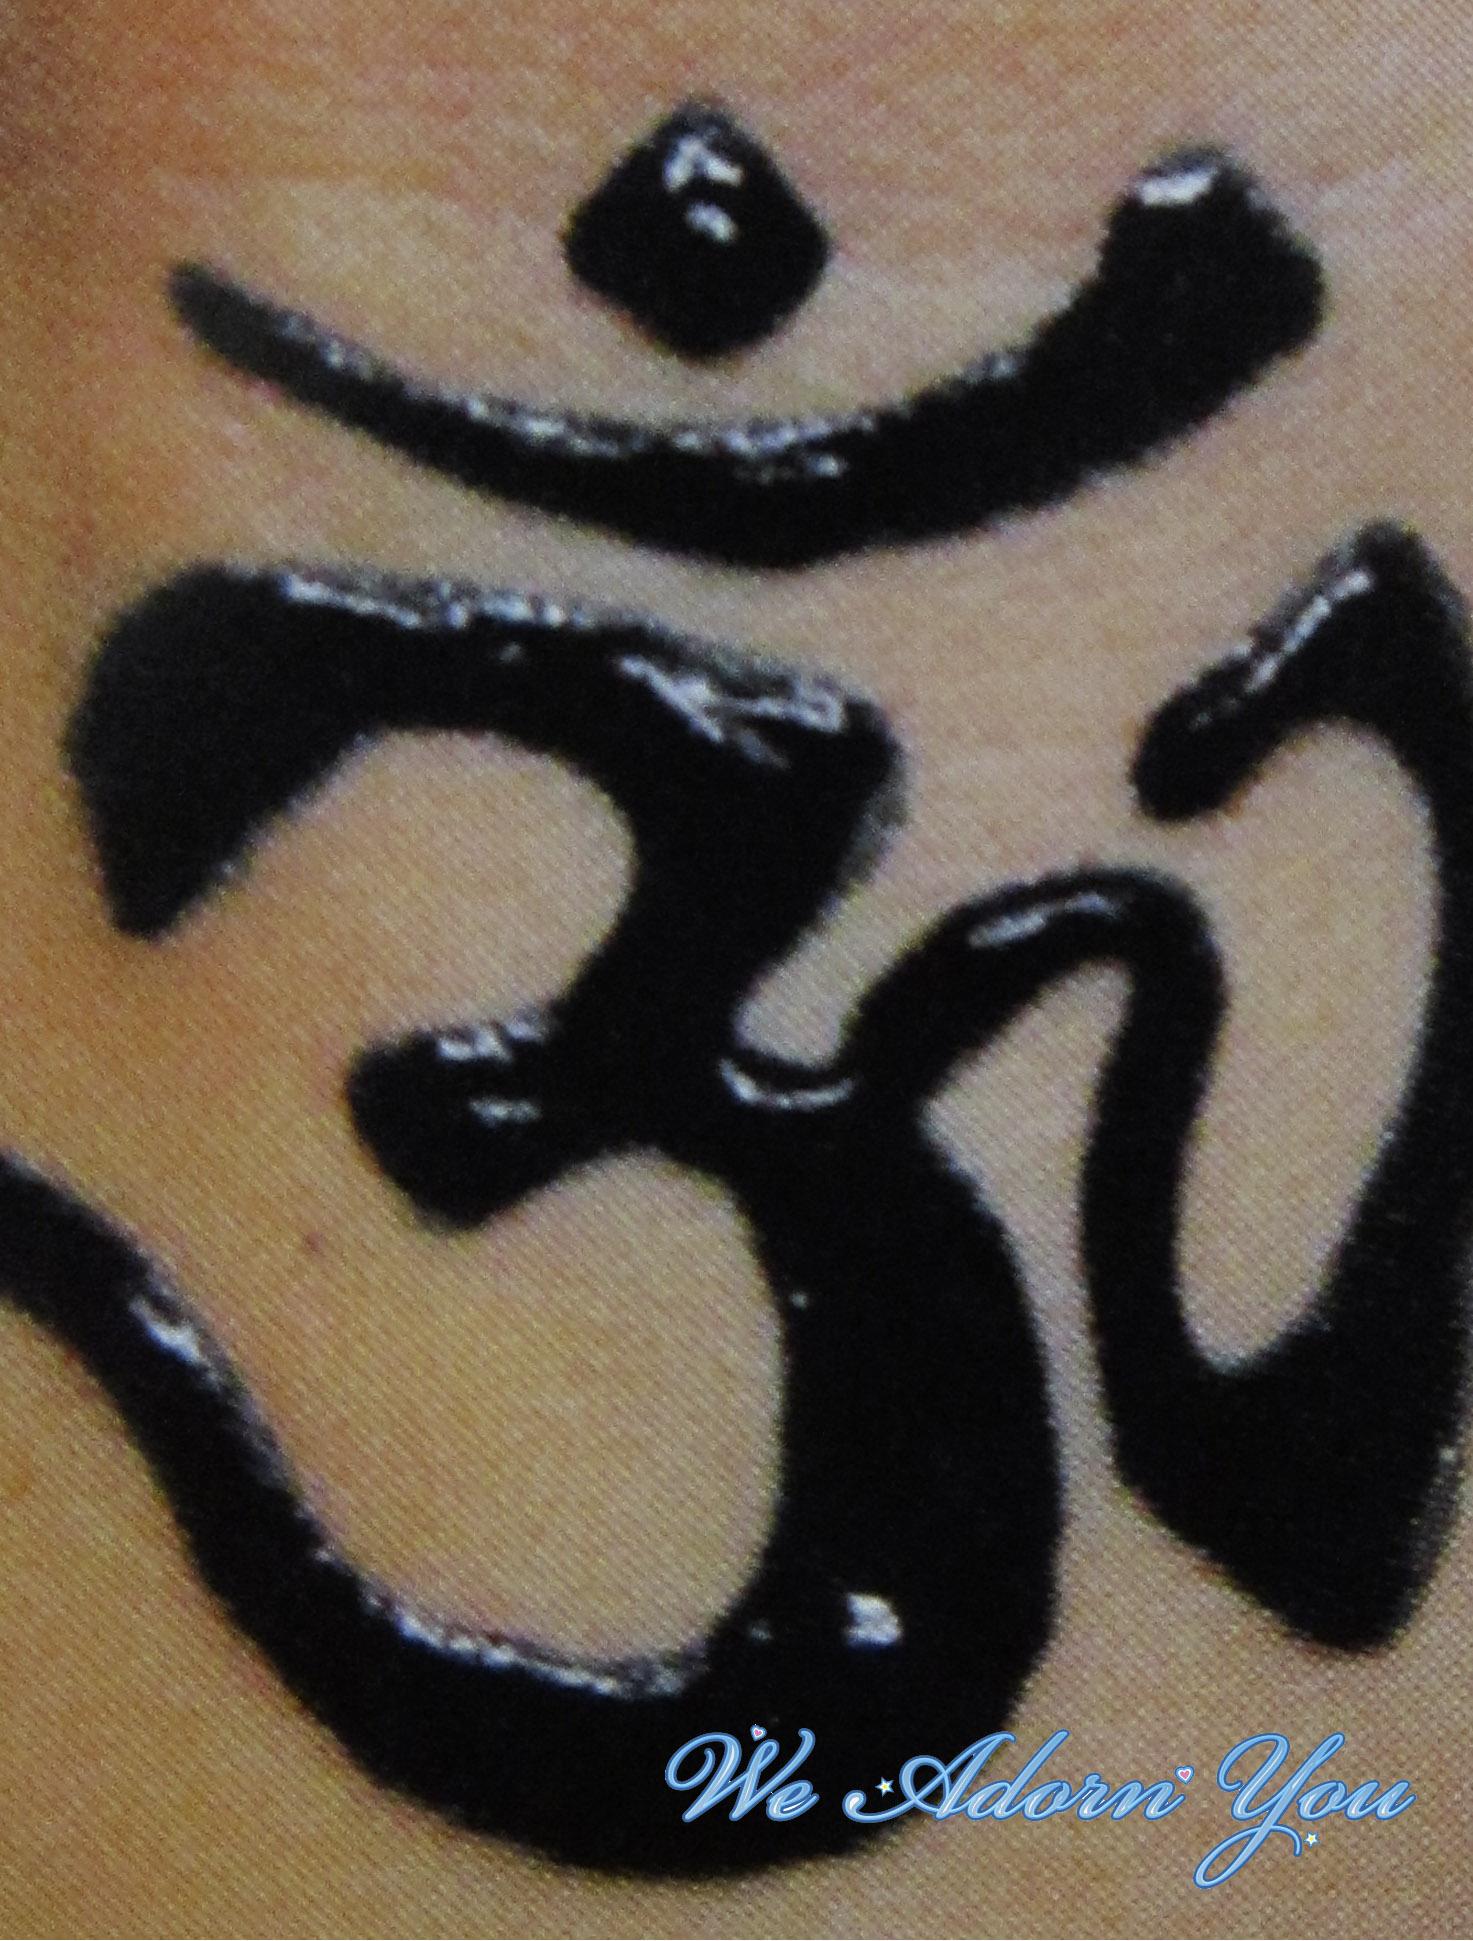 Jagua Ohm - We Adorn You.jpg